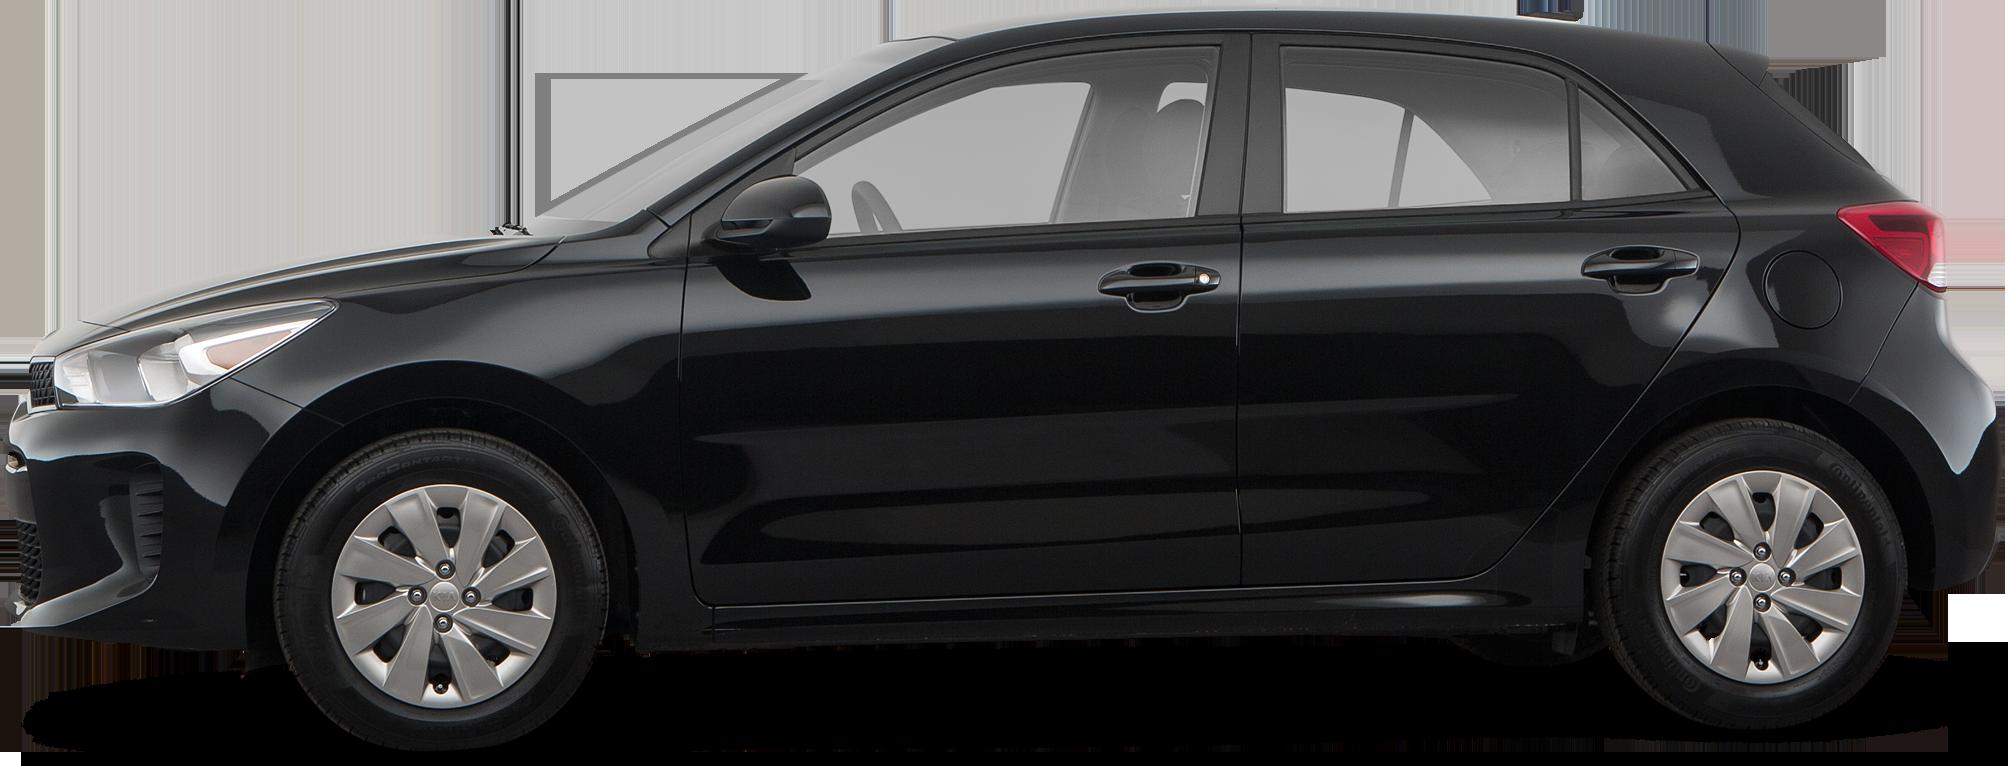 2019 Kia Rio Hatchback S